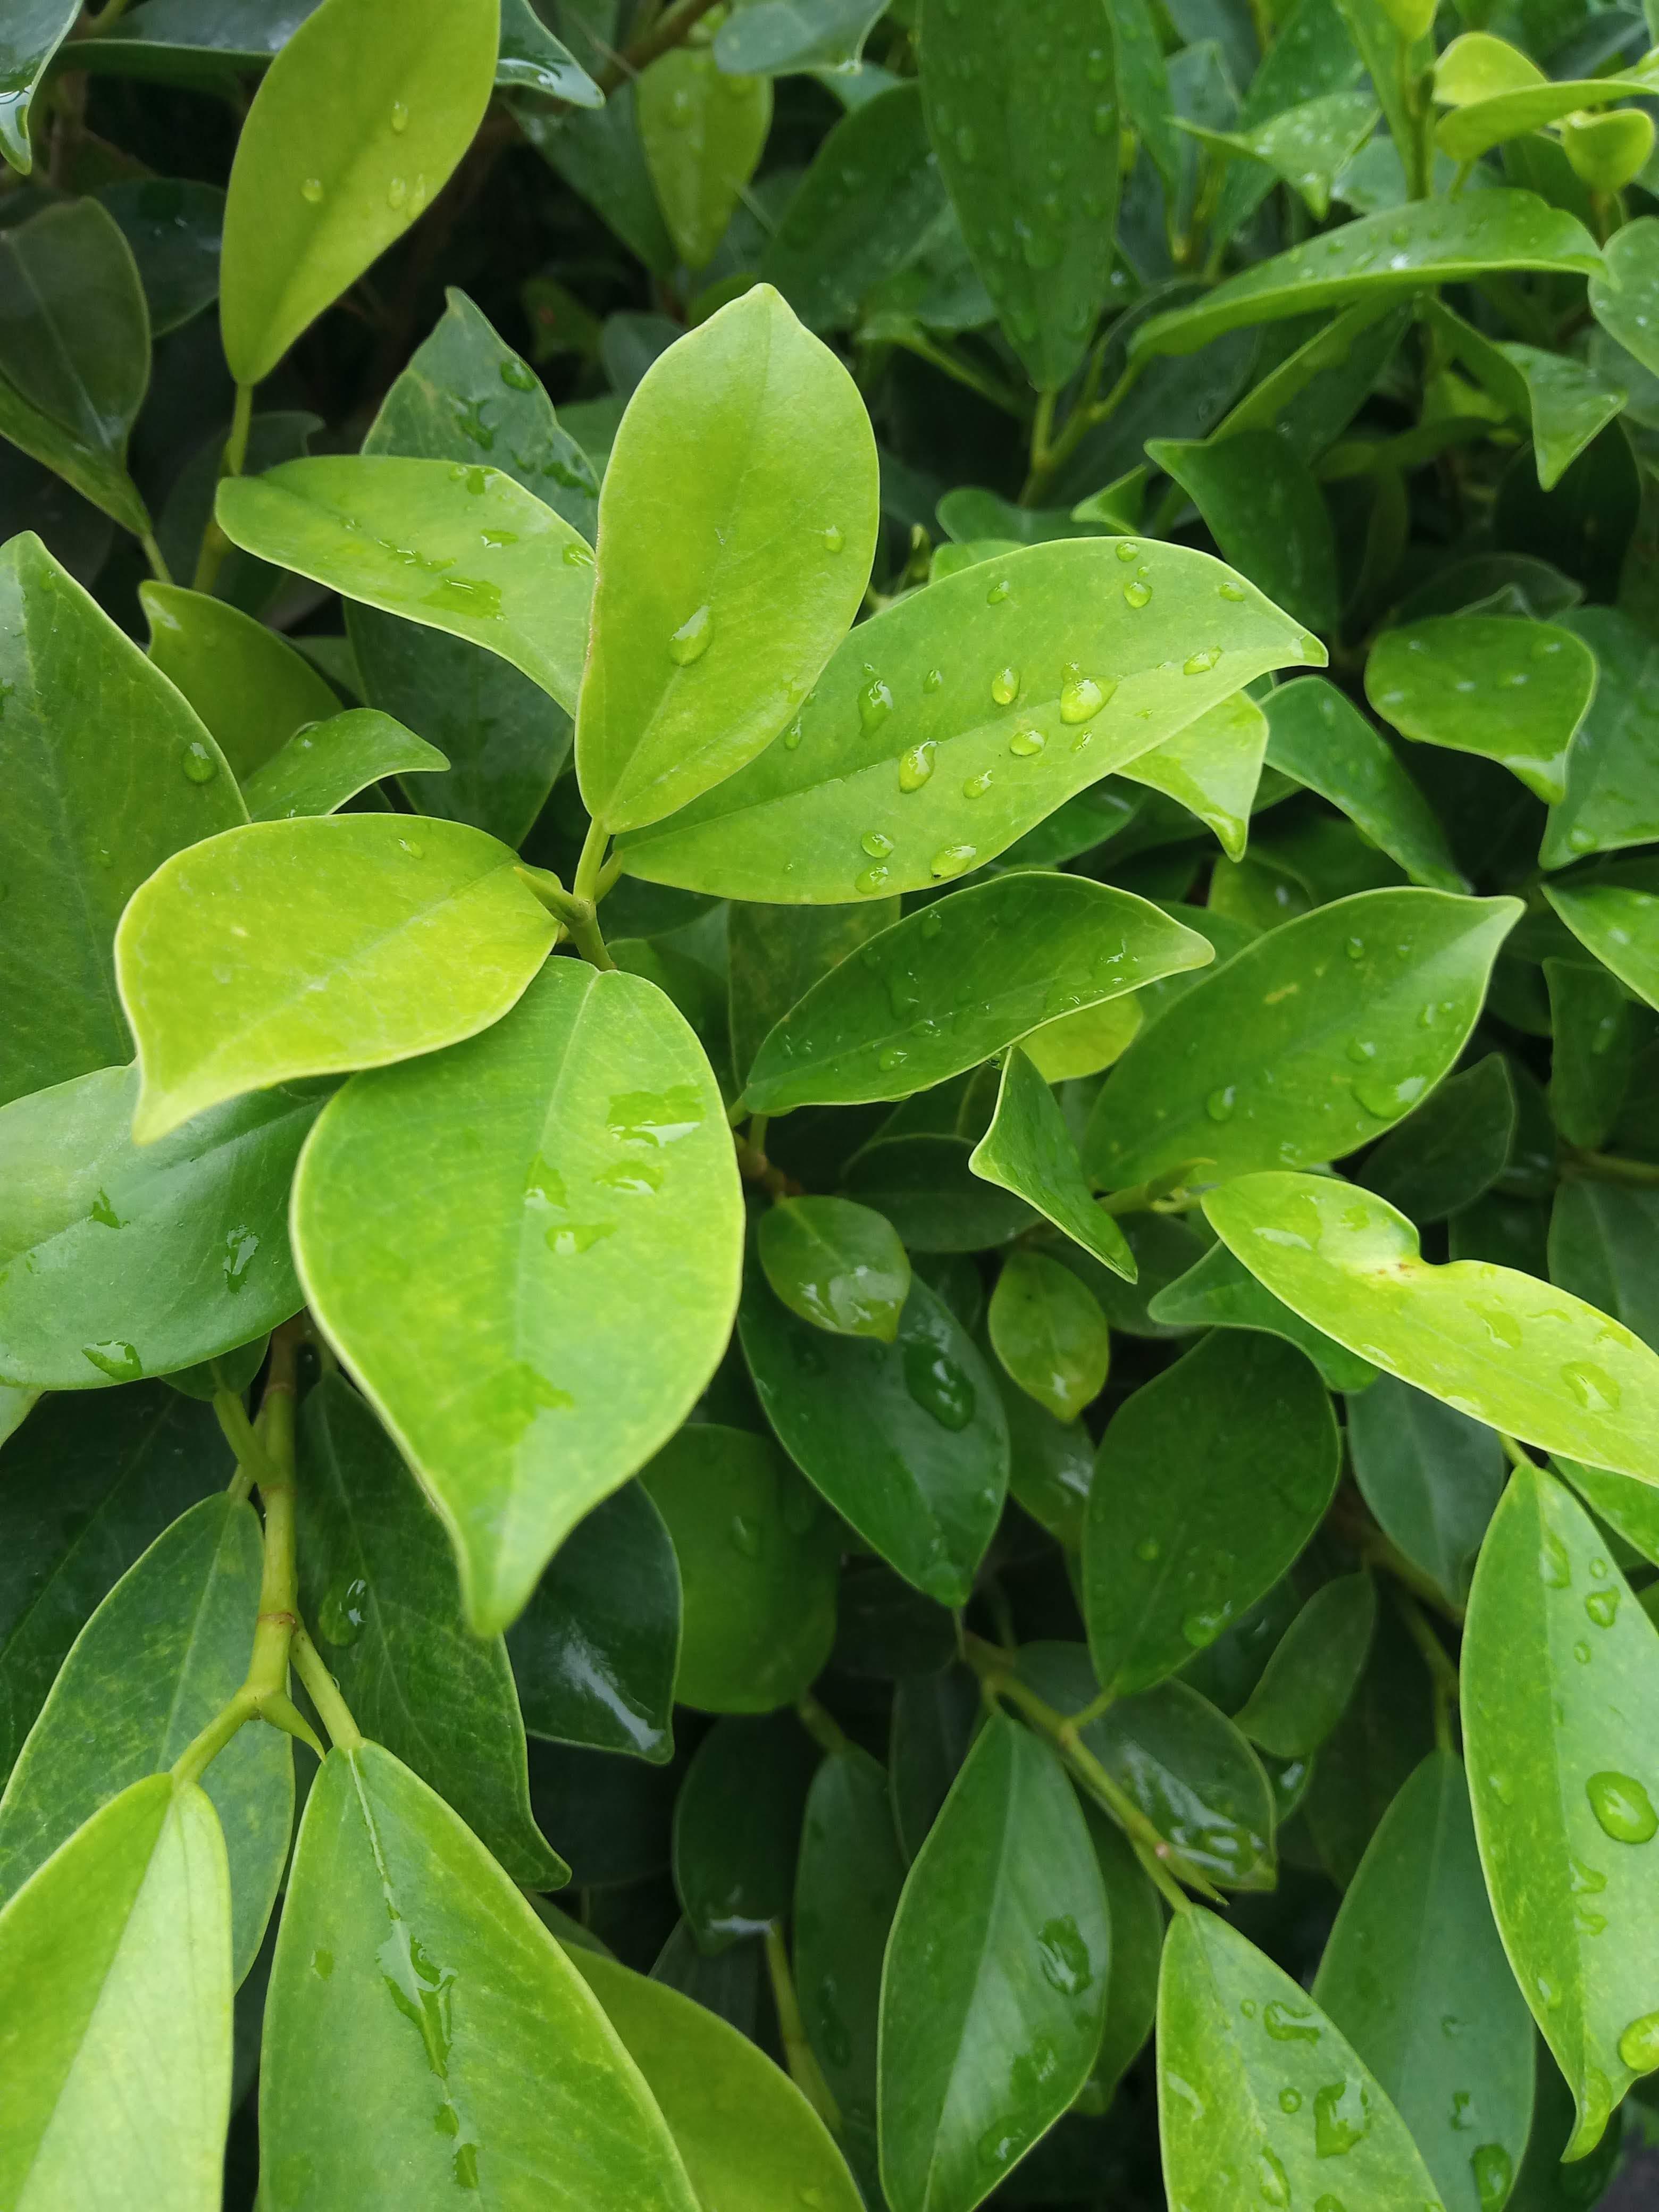 Free stock photo of droplets, drops, garden, garden plant